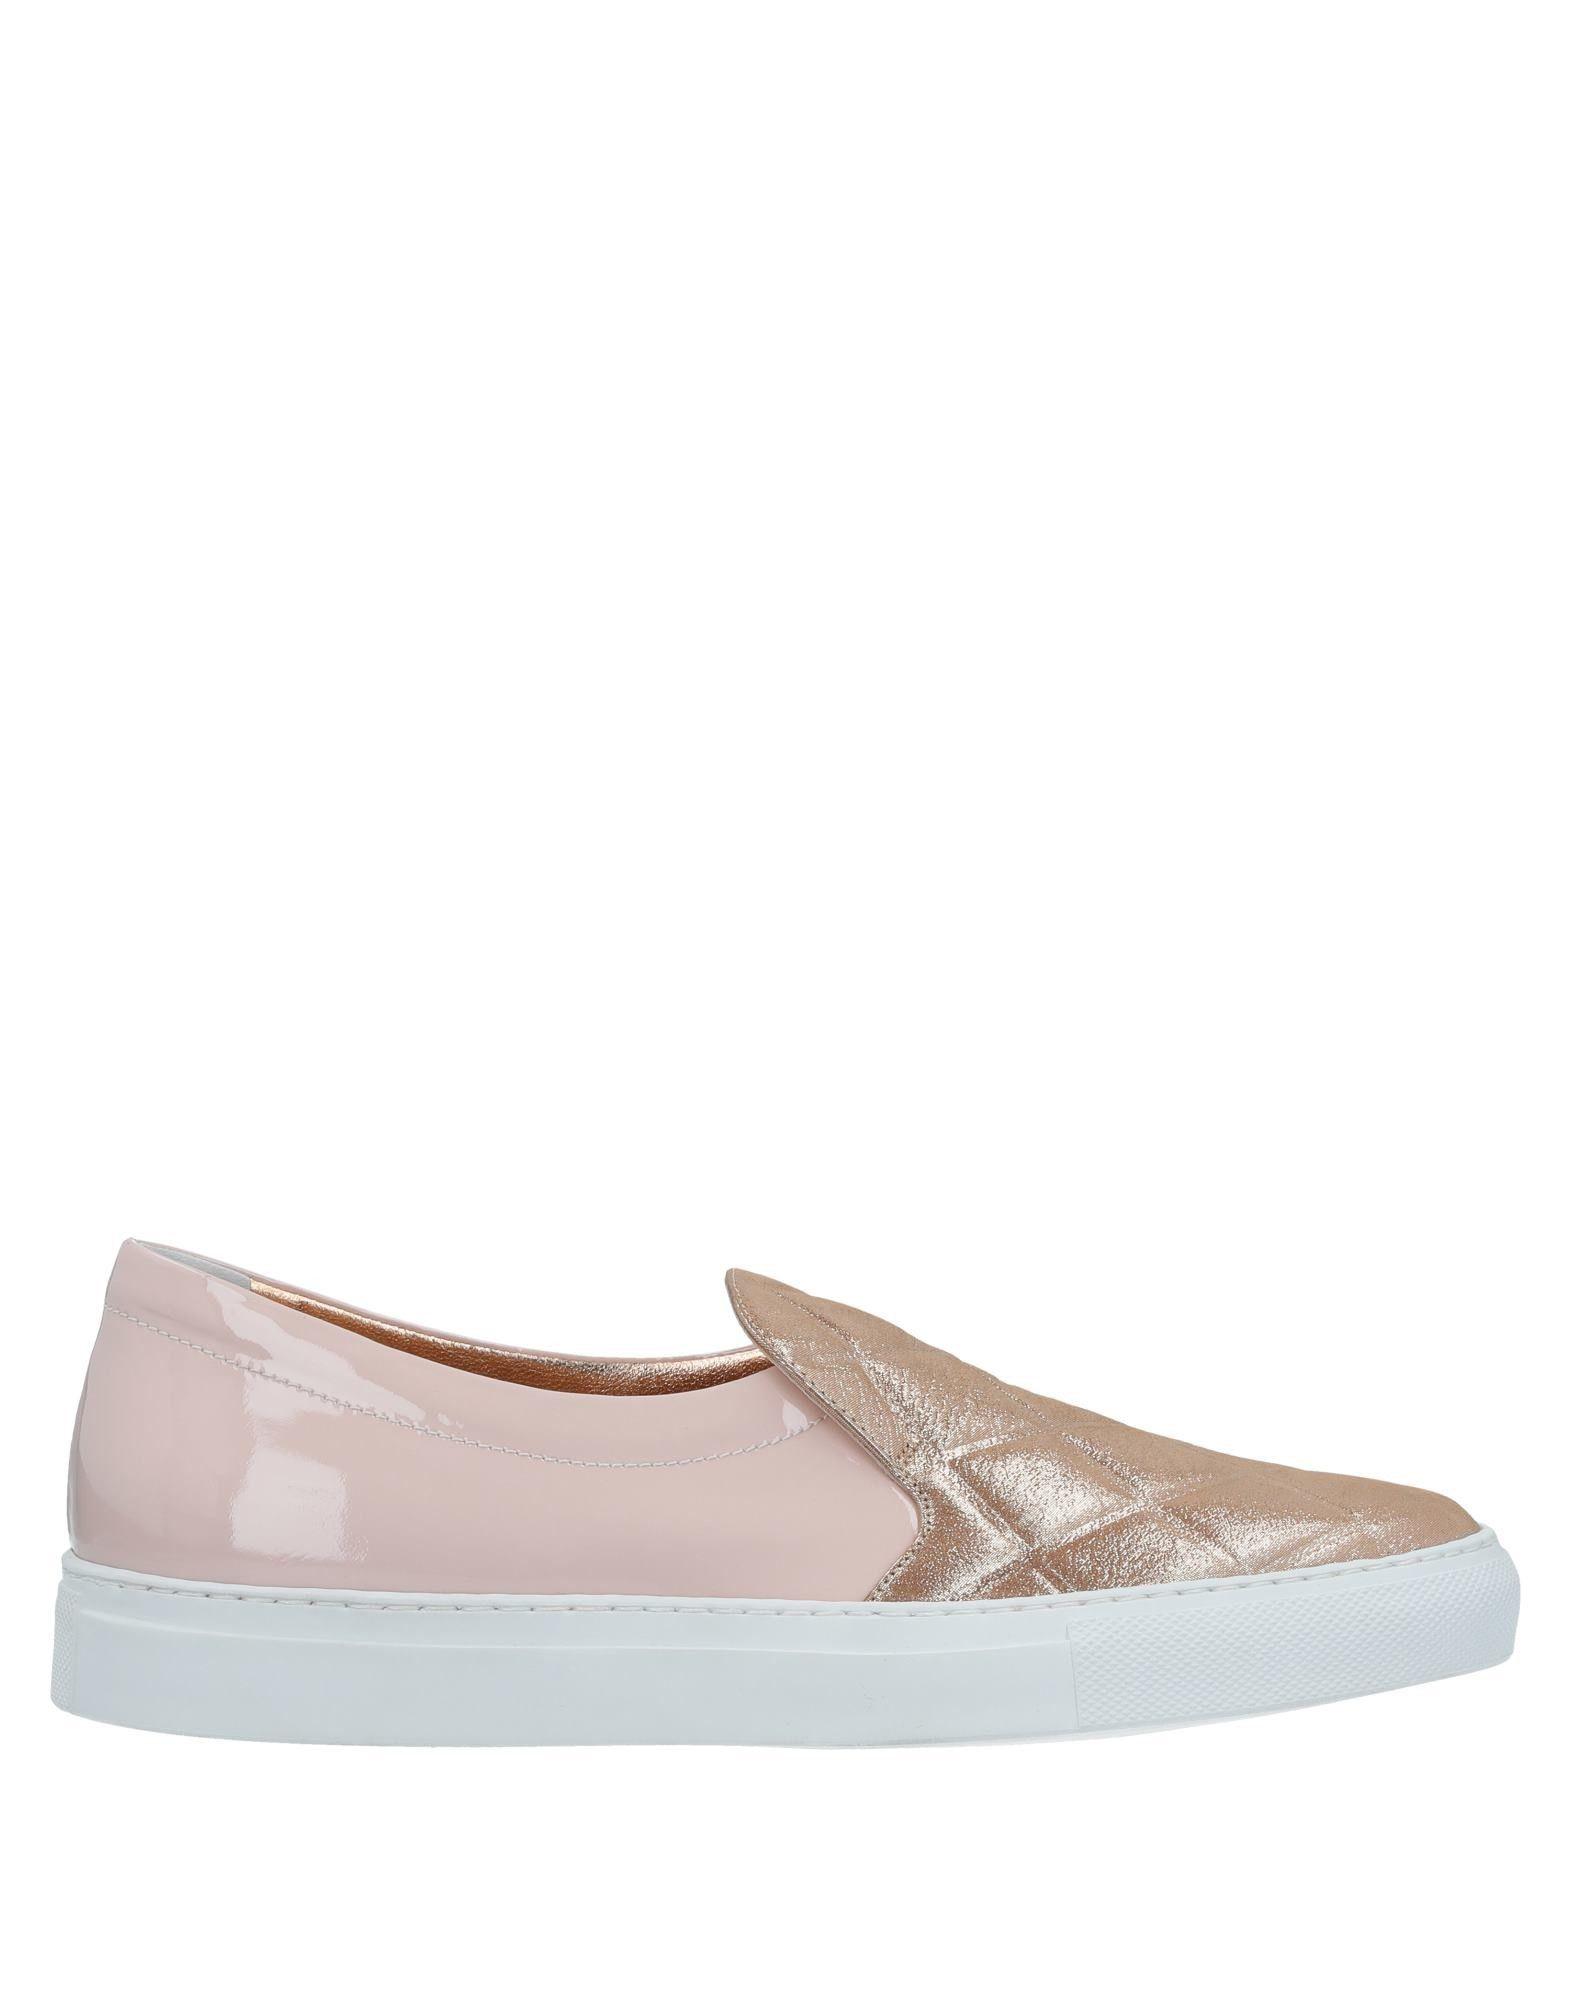 Rodo Sneakers 11527632NHGut Damen  11527632NHGut Sneakers aussehende strapazierfähige Schuhe f30f3a